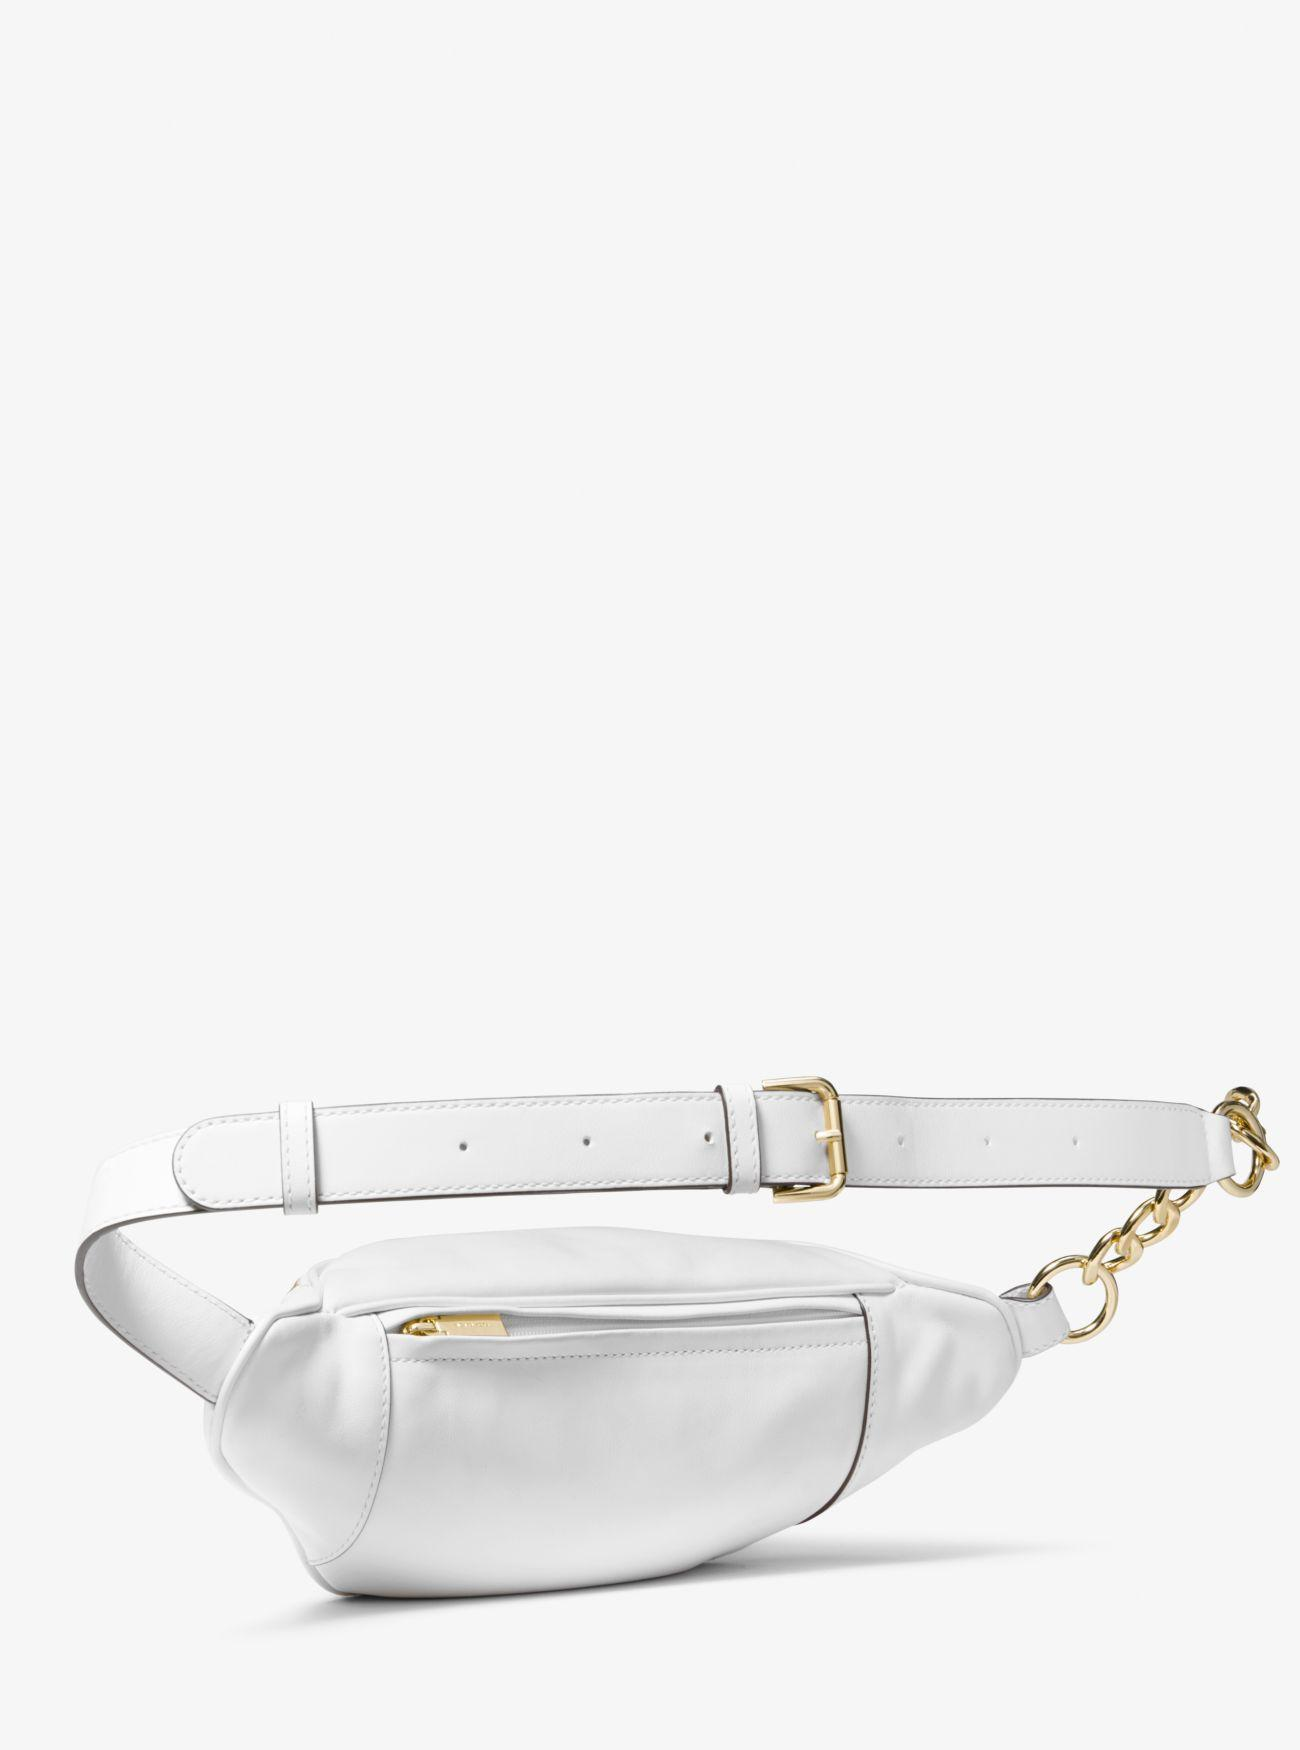 37cb36423fb0 Michael Kors - White Medium Embellished Leather Belt Bag - Lyst. View  fullscreen